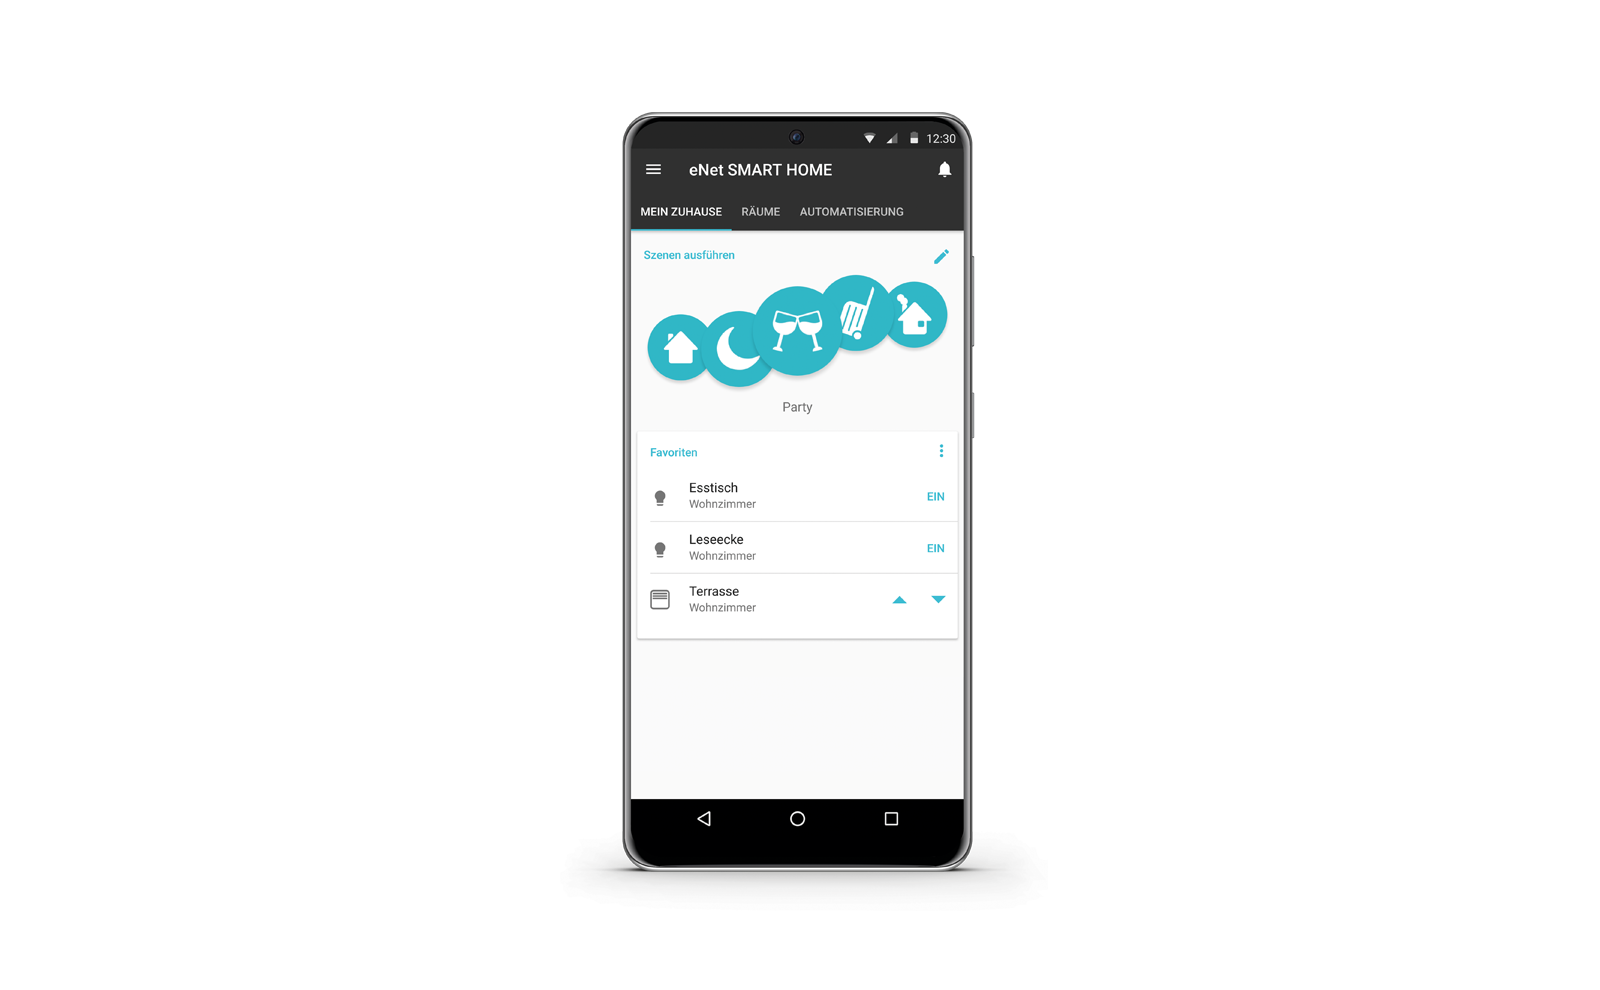 eNet Smartphone App Samsung Galaxy Android